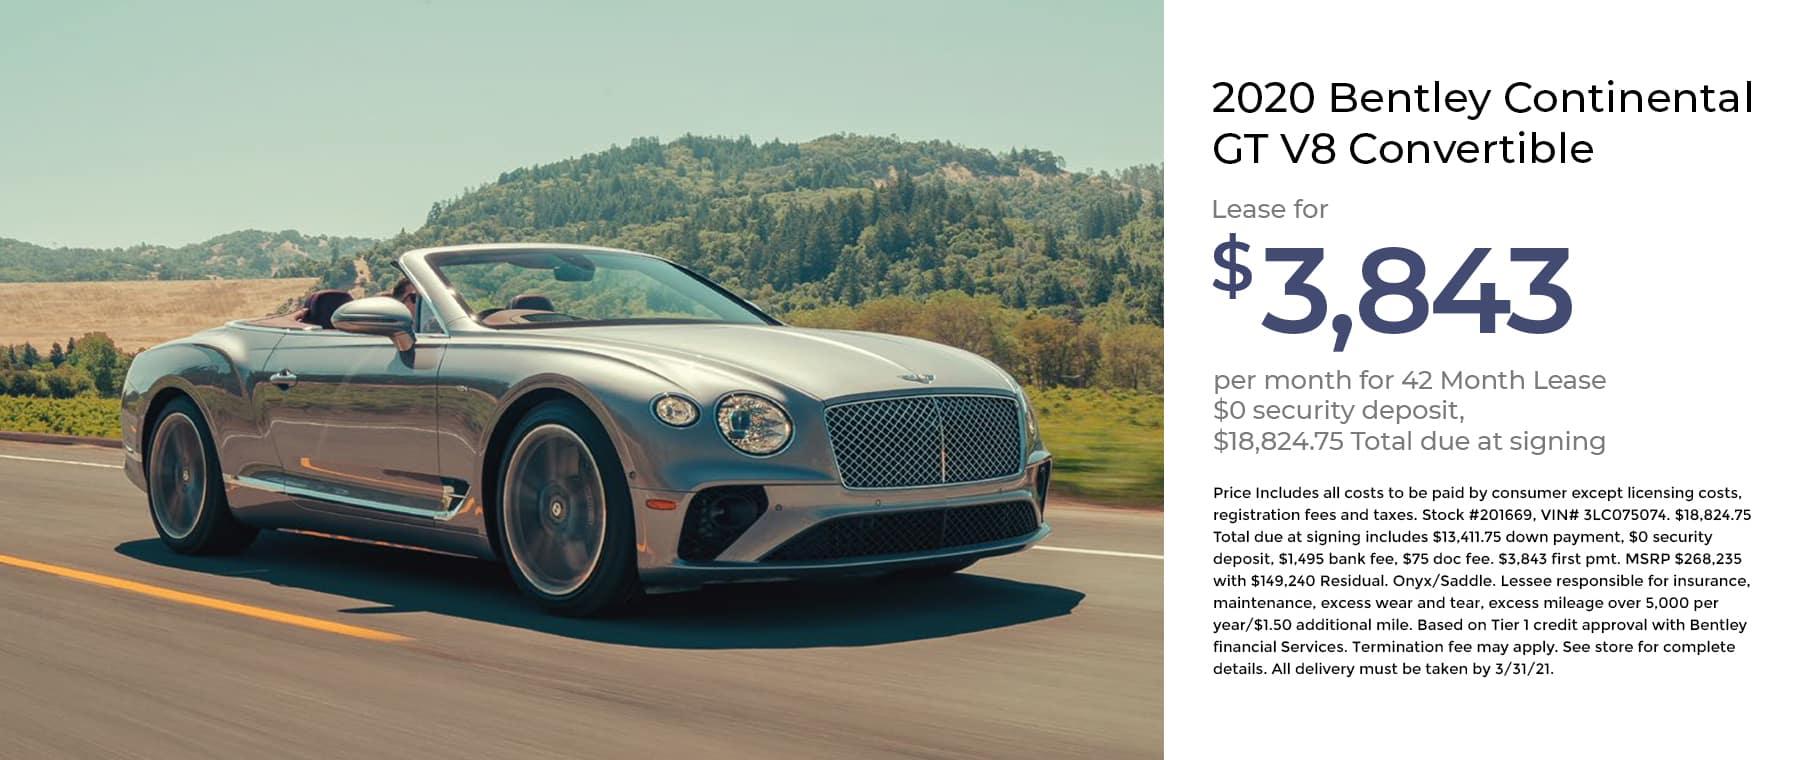 Bentley Continental GT V8 Convertible 1800×760 January 2021